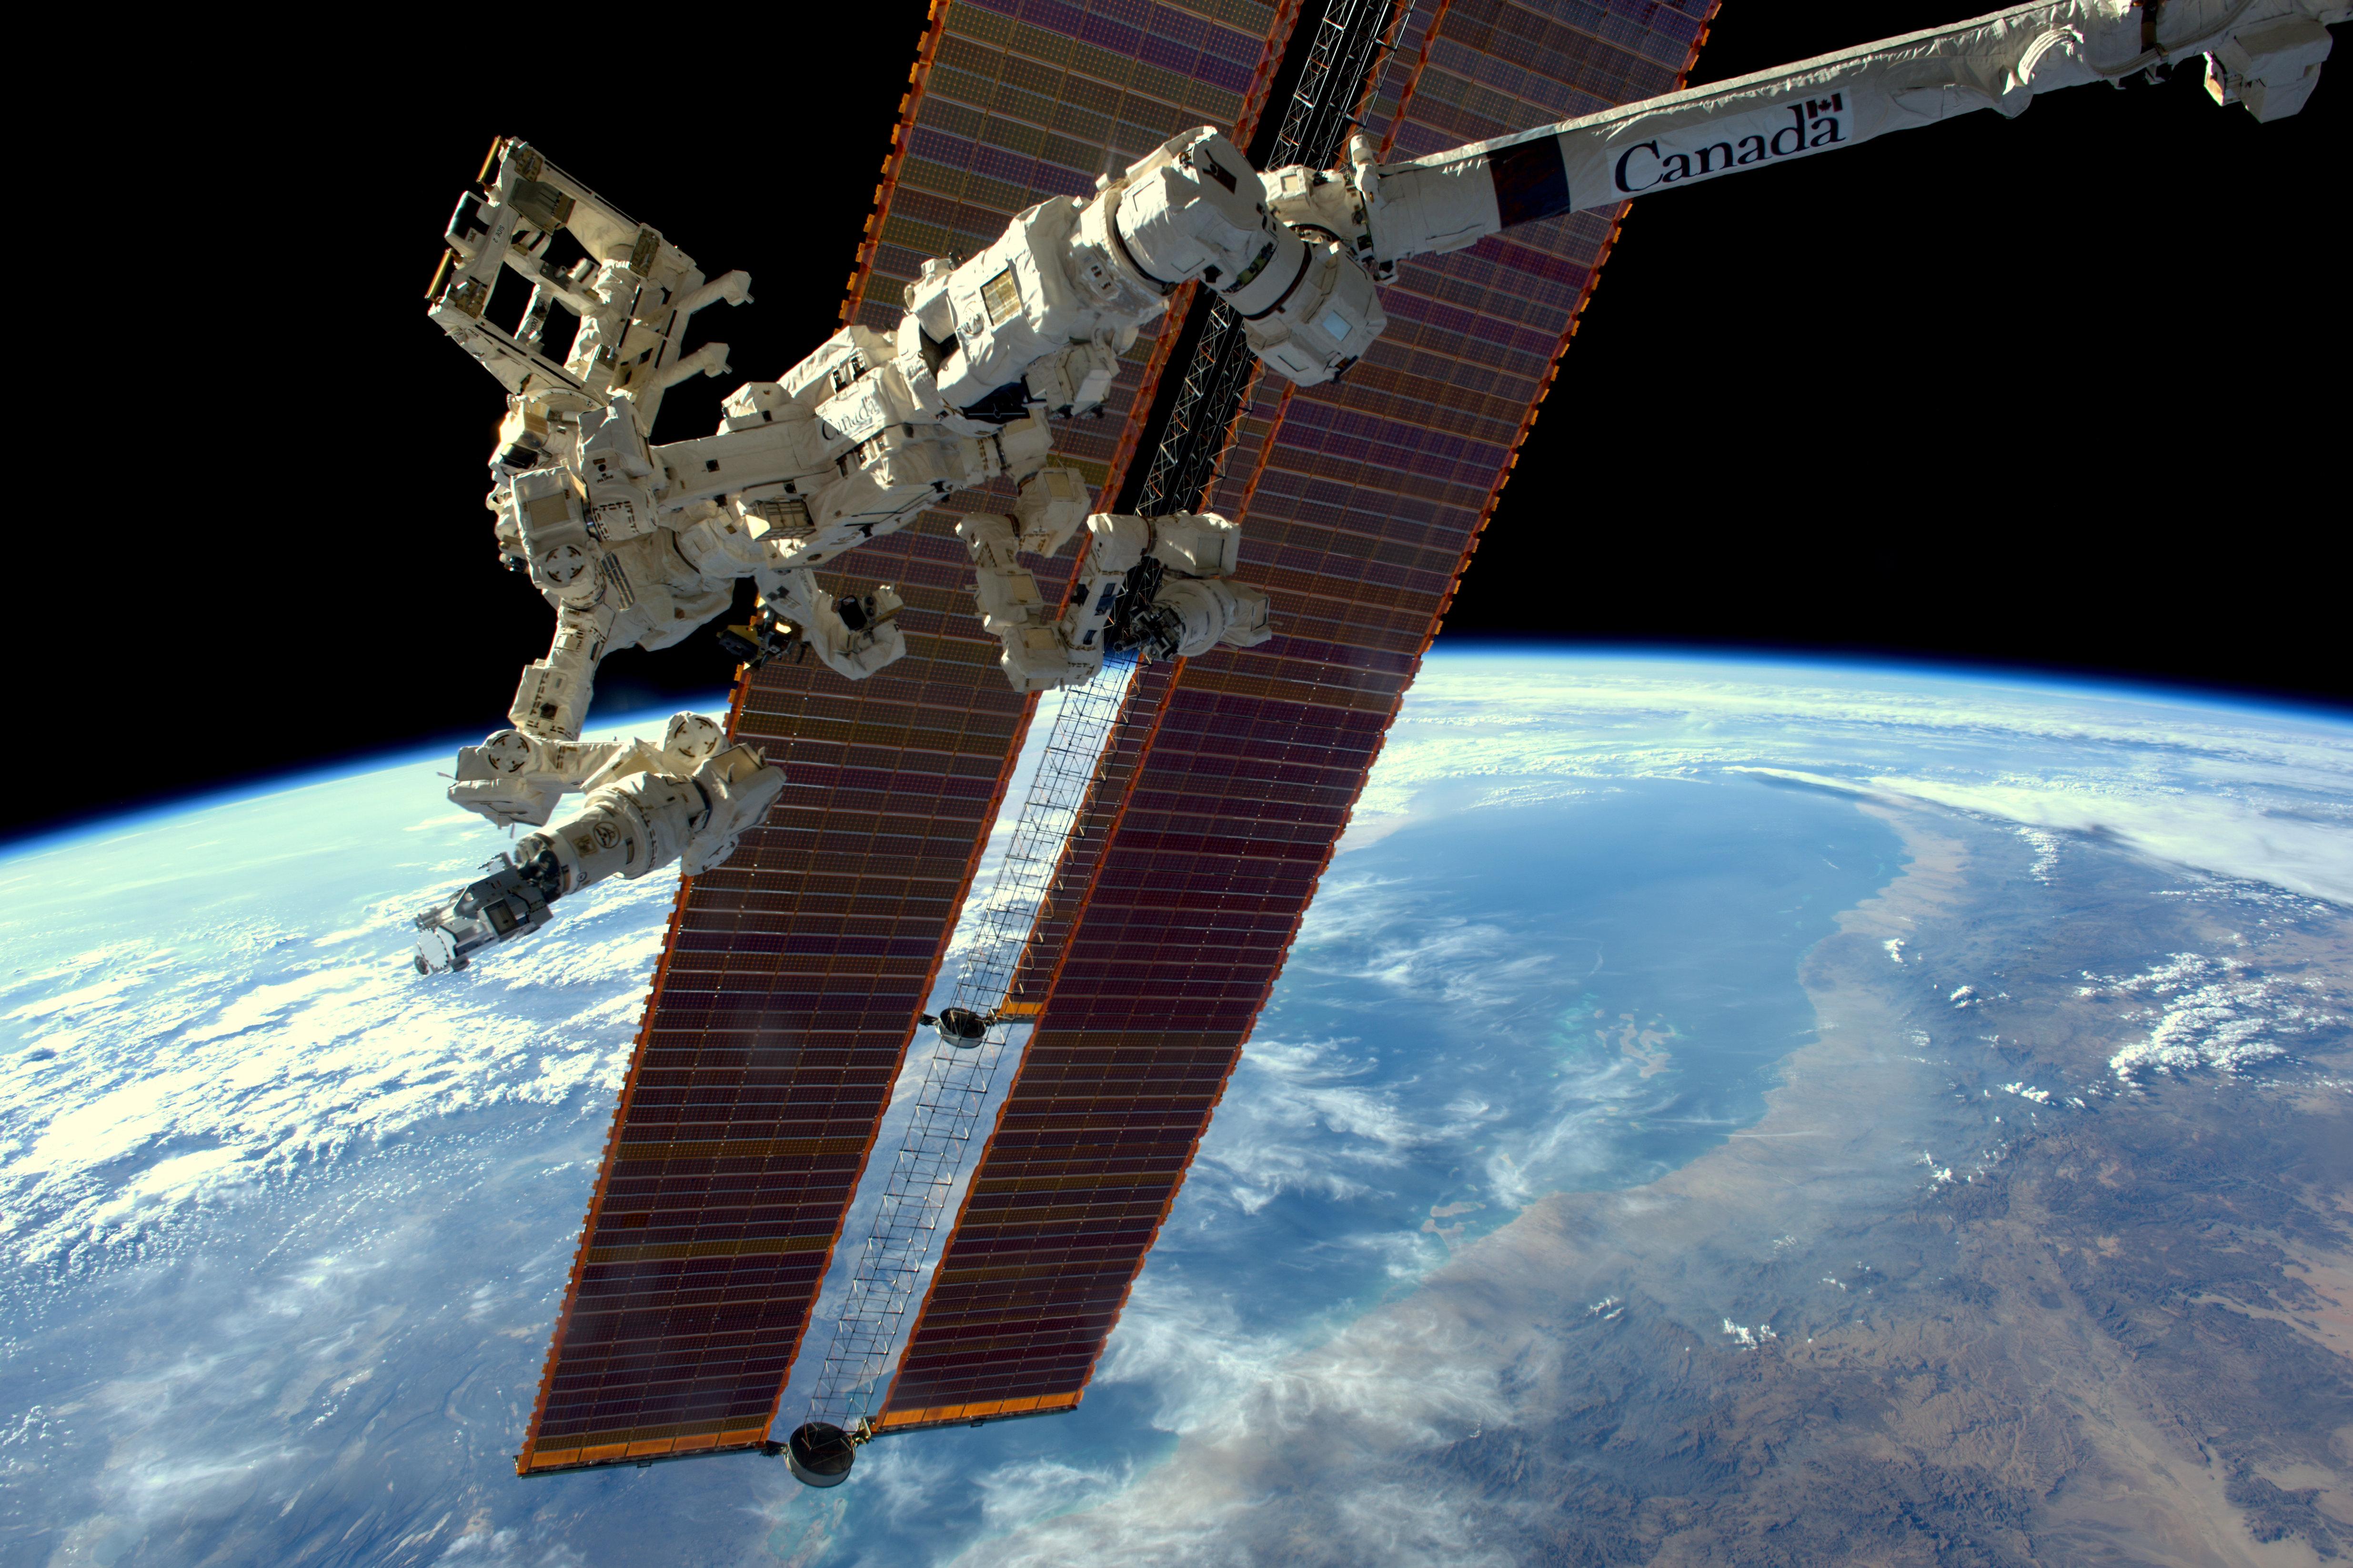 NASA's Robotic 'Sniffer' Confirms Space Station Leak ...